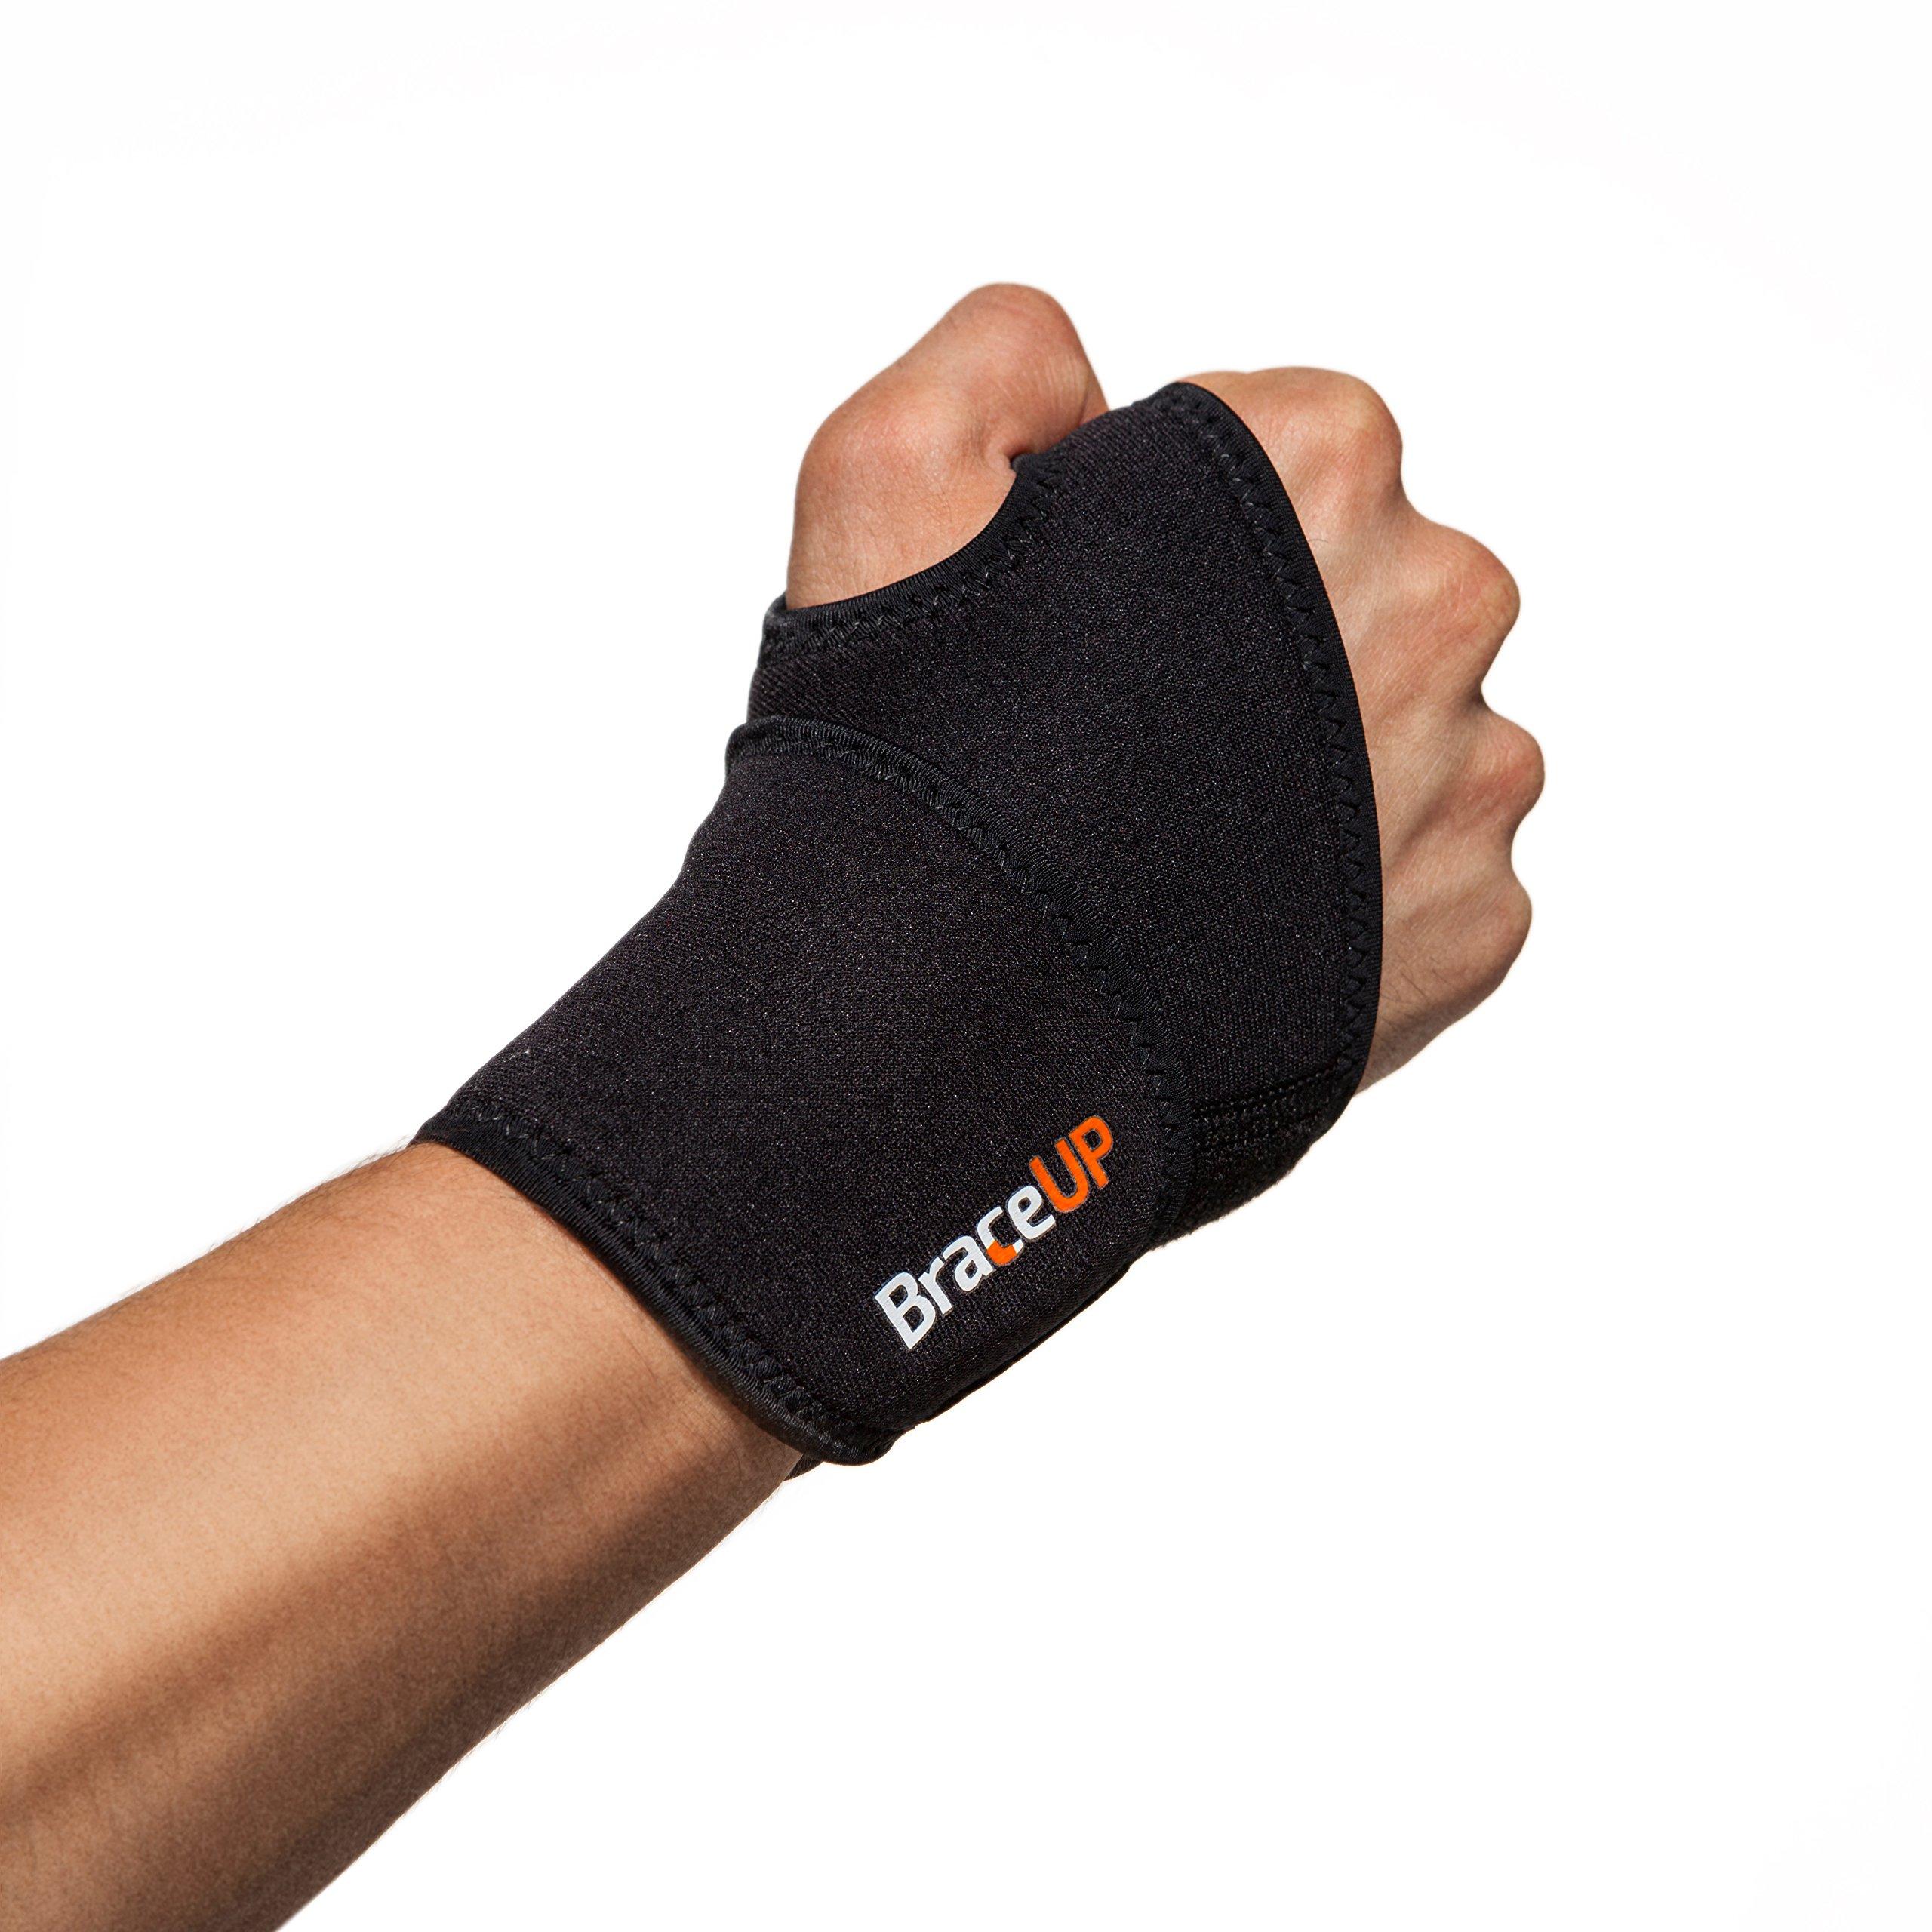 BraceUP® Adjustable Wrist Support, One Size Adjustable (Black)